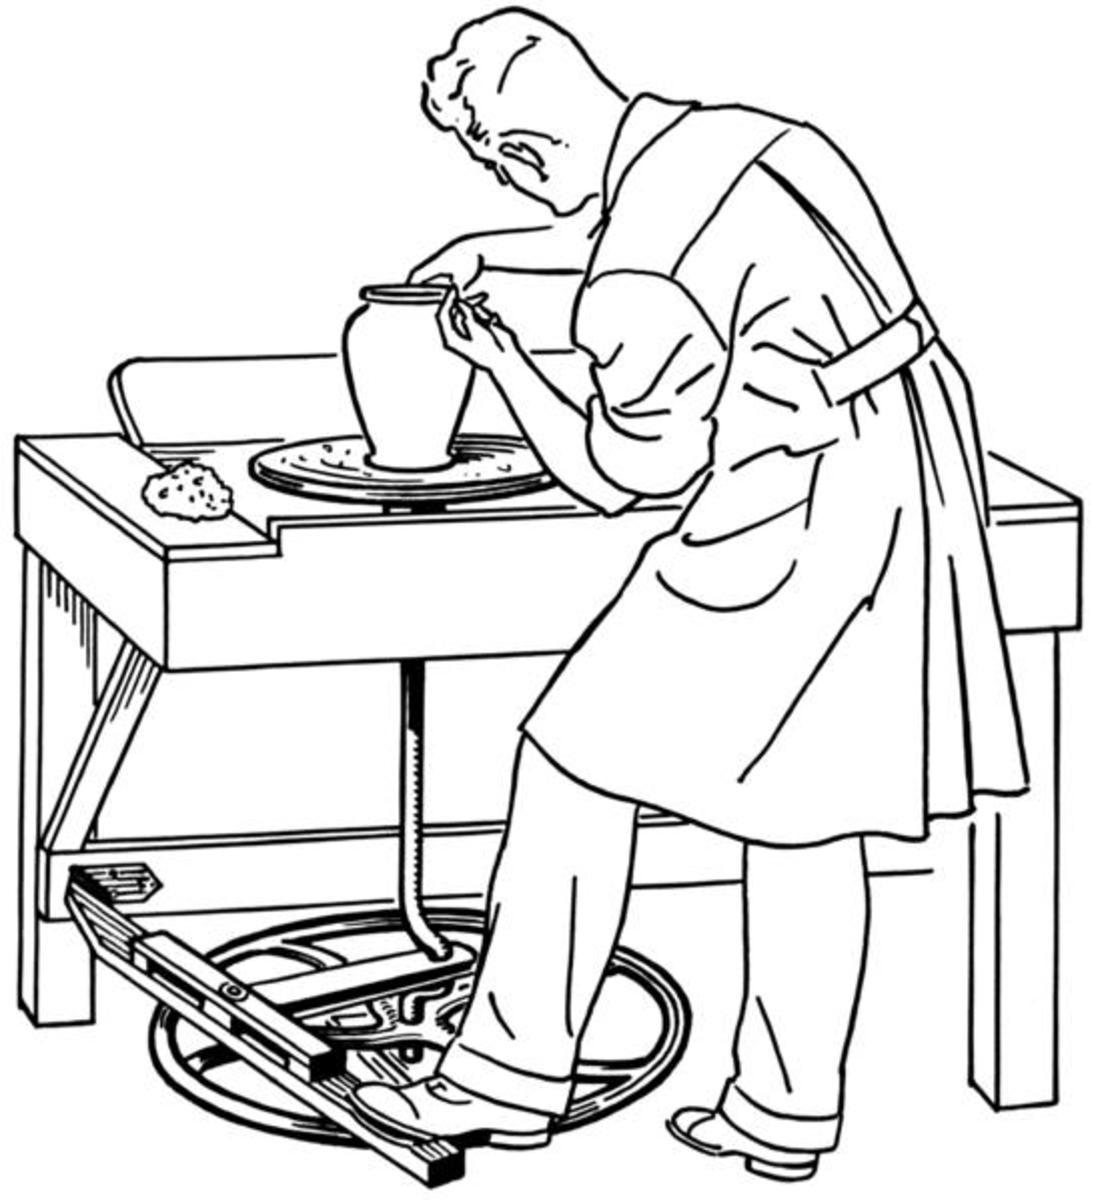 How to Make Pottery - How to Make Ceramics